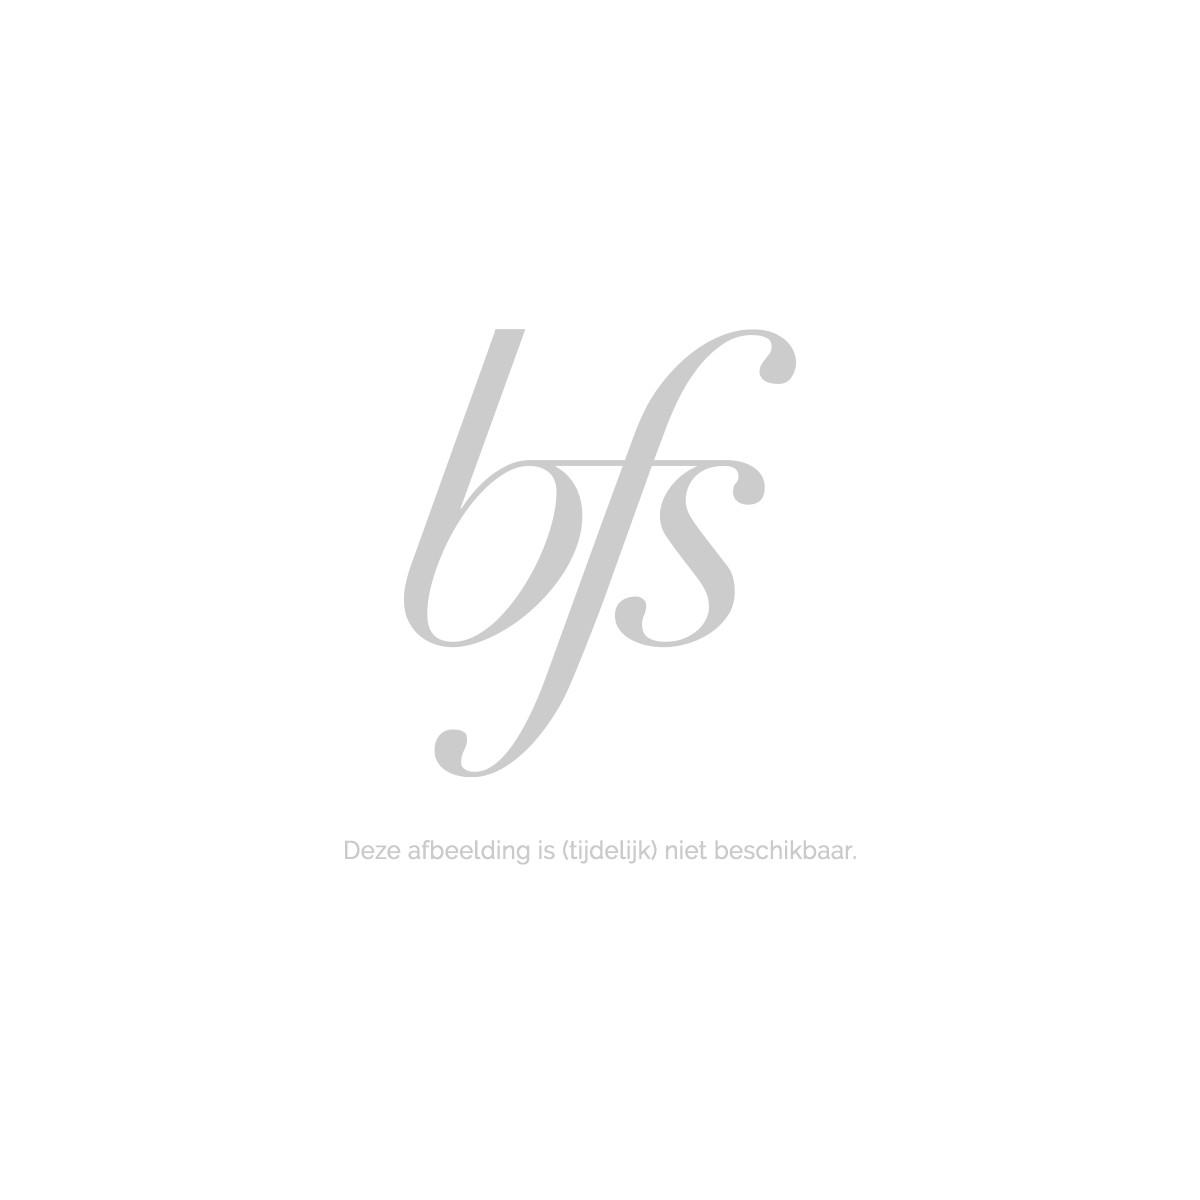 Afbeelding van Dr. Eckstein Azulen Milcheiweiss 50 Ml Crème Roodheid Beauty